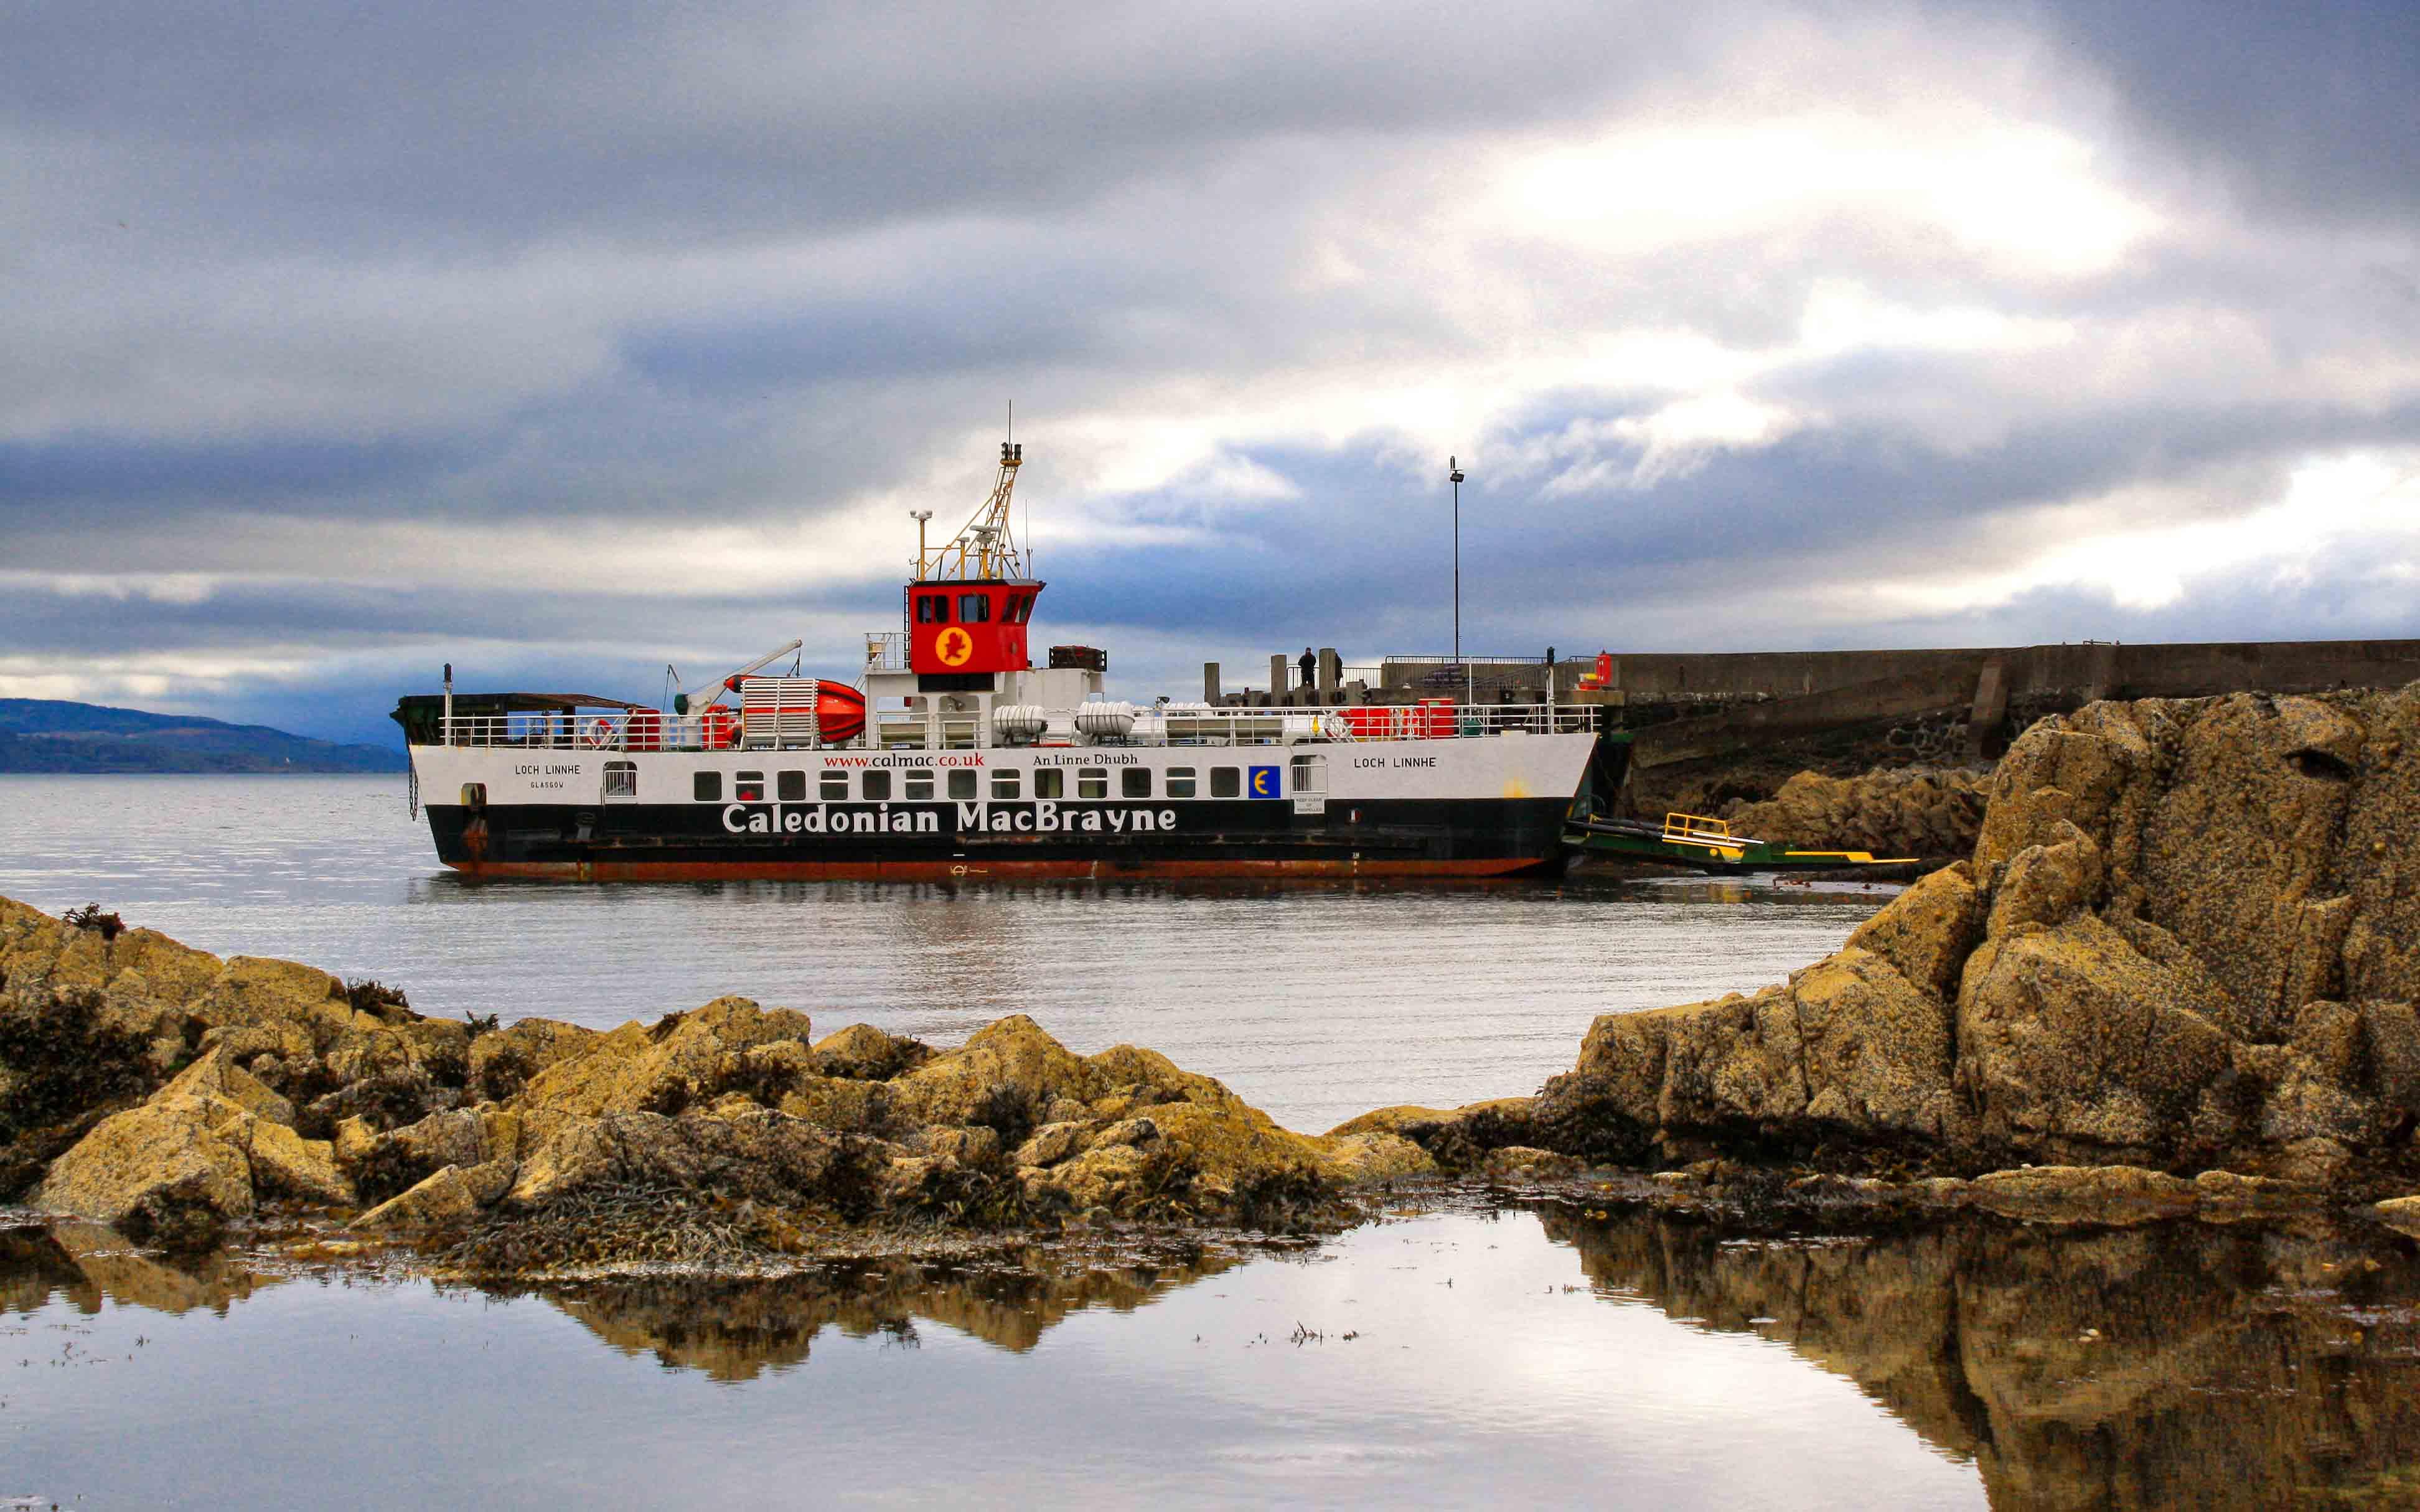 Loch Linnhe at Kilchoan (Ships of CalMac)